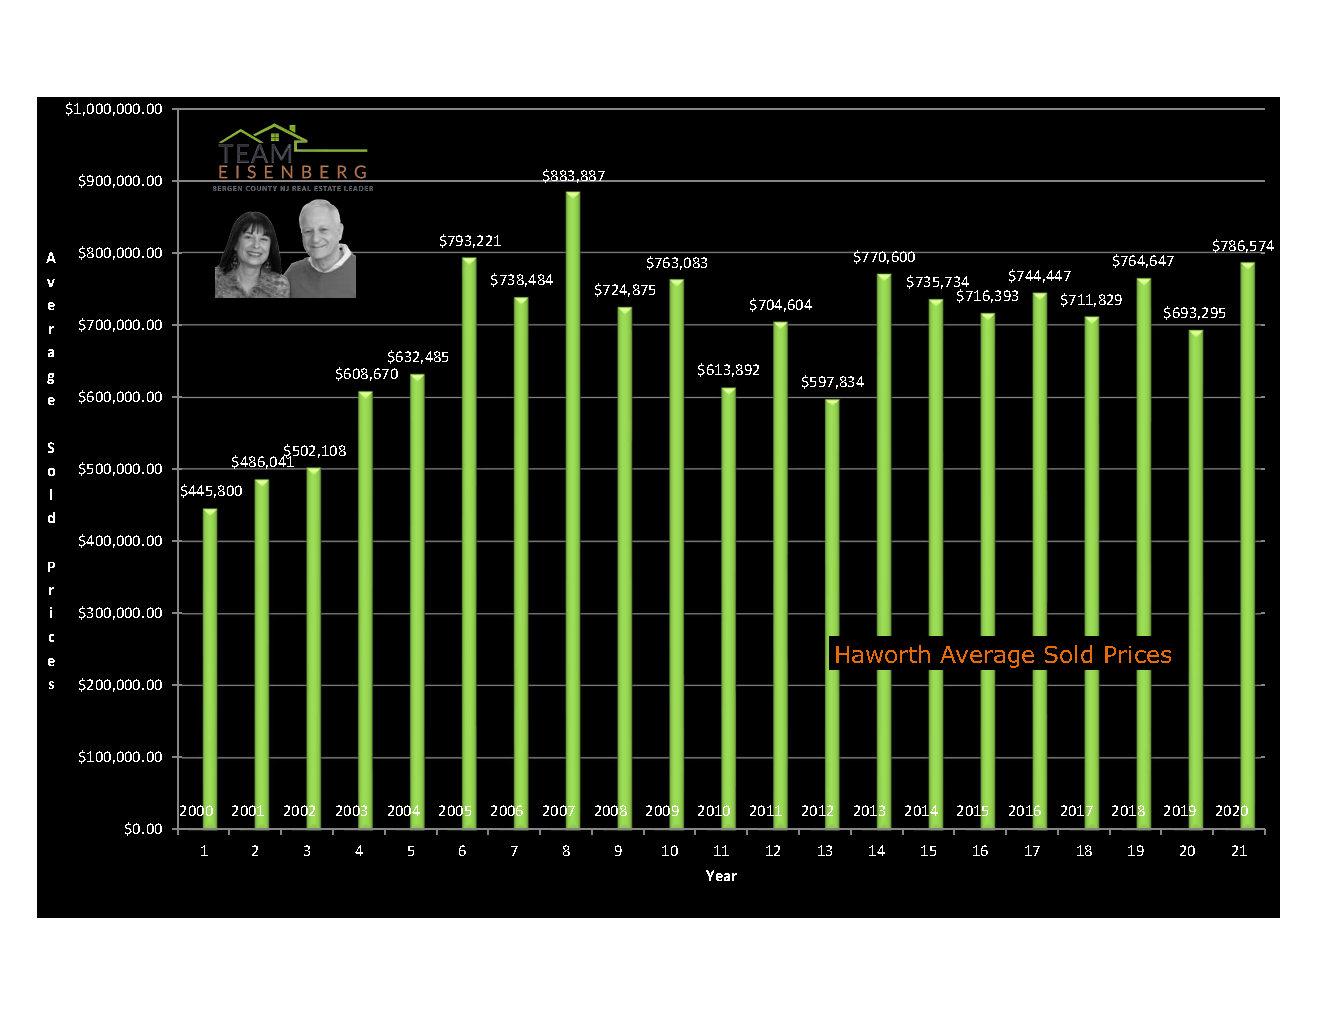 Haworth | Average Sold Prces | 2000-2020